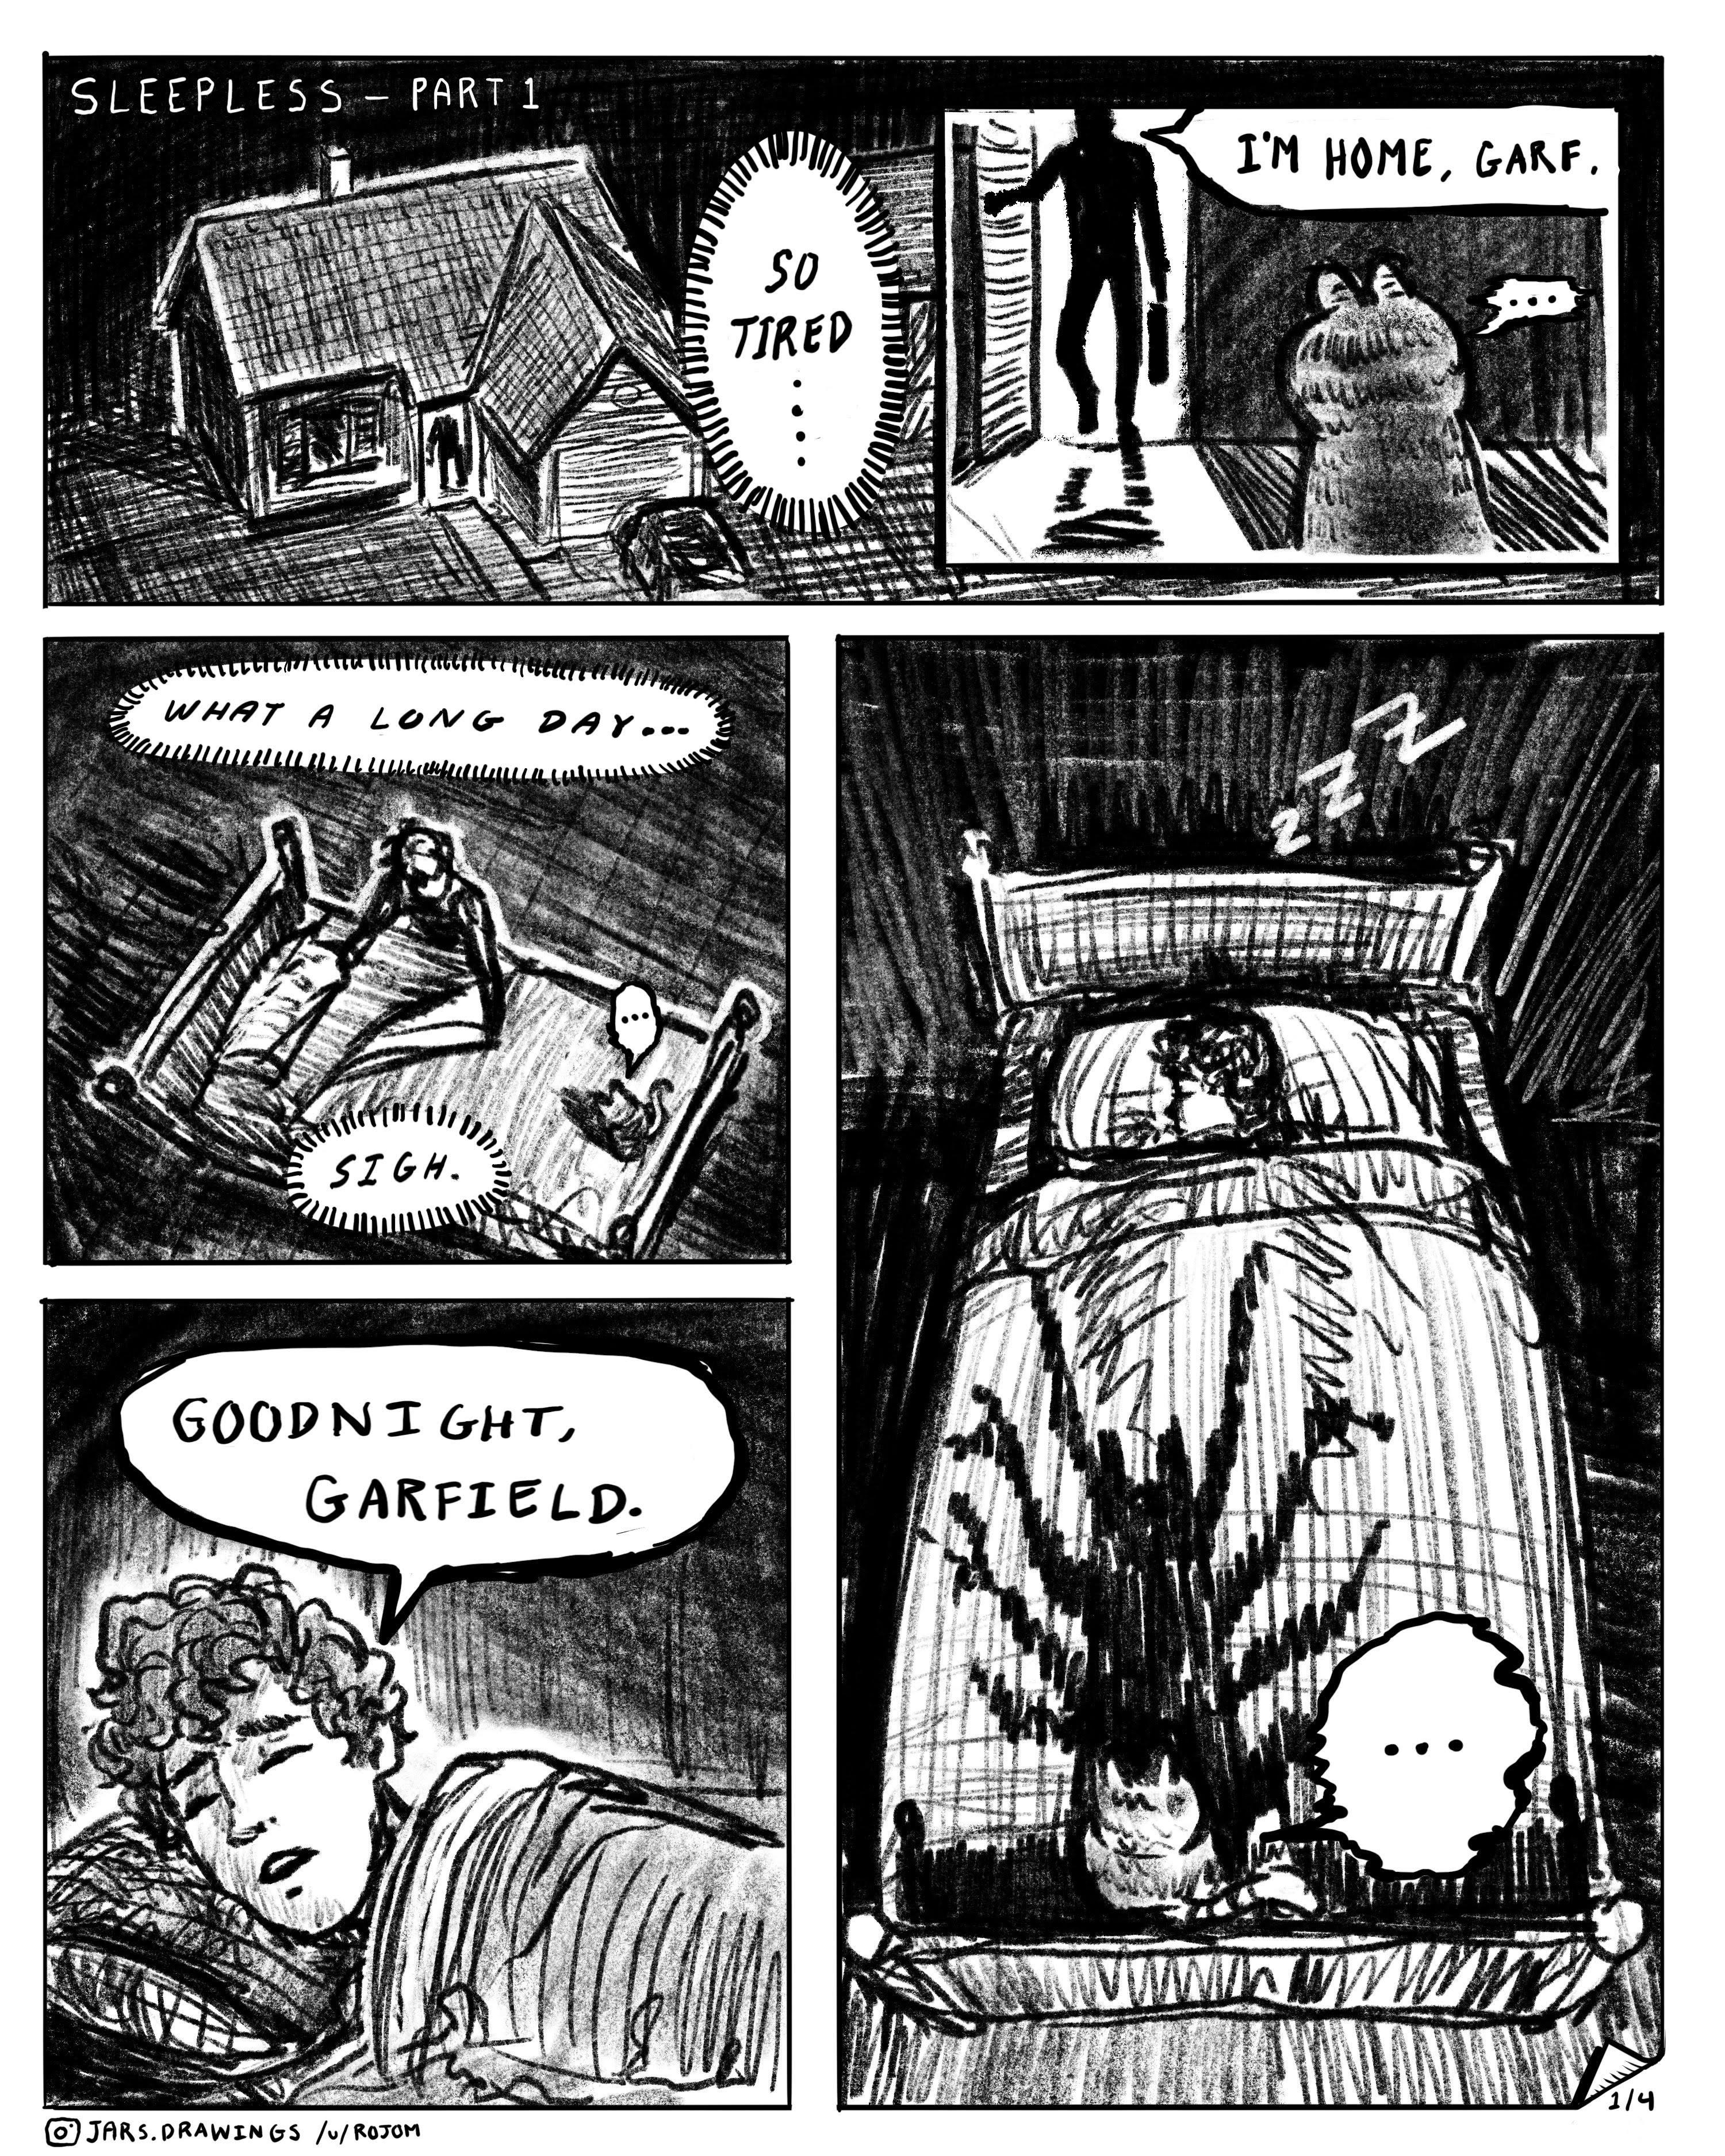 Sleepless Part 1 R Imsorryjon Creepy Garfield Know Your Meme